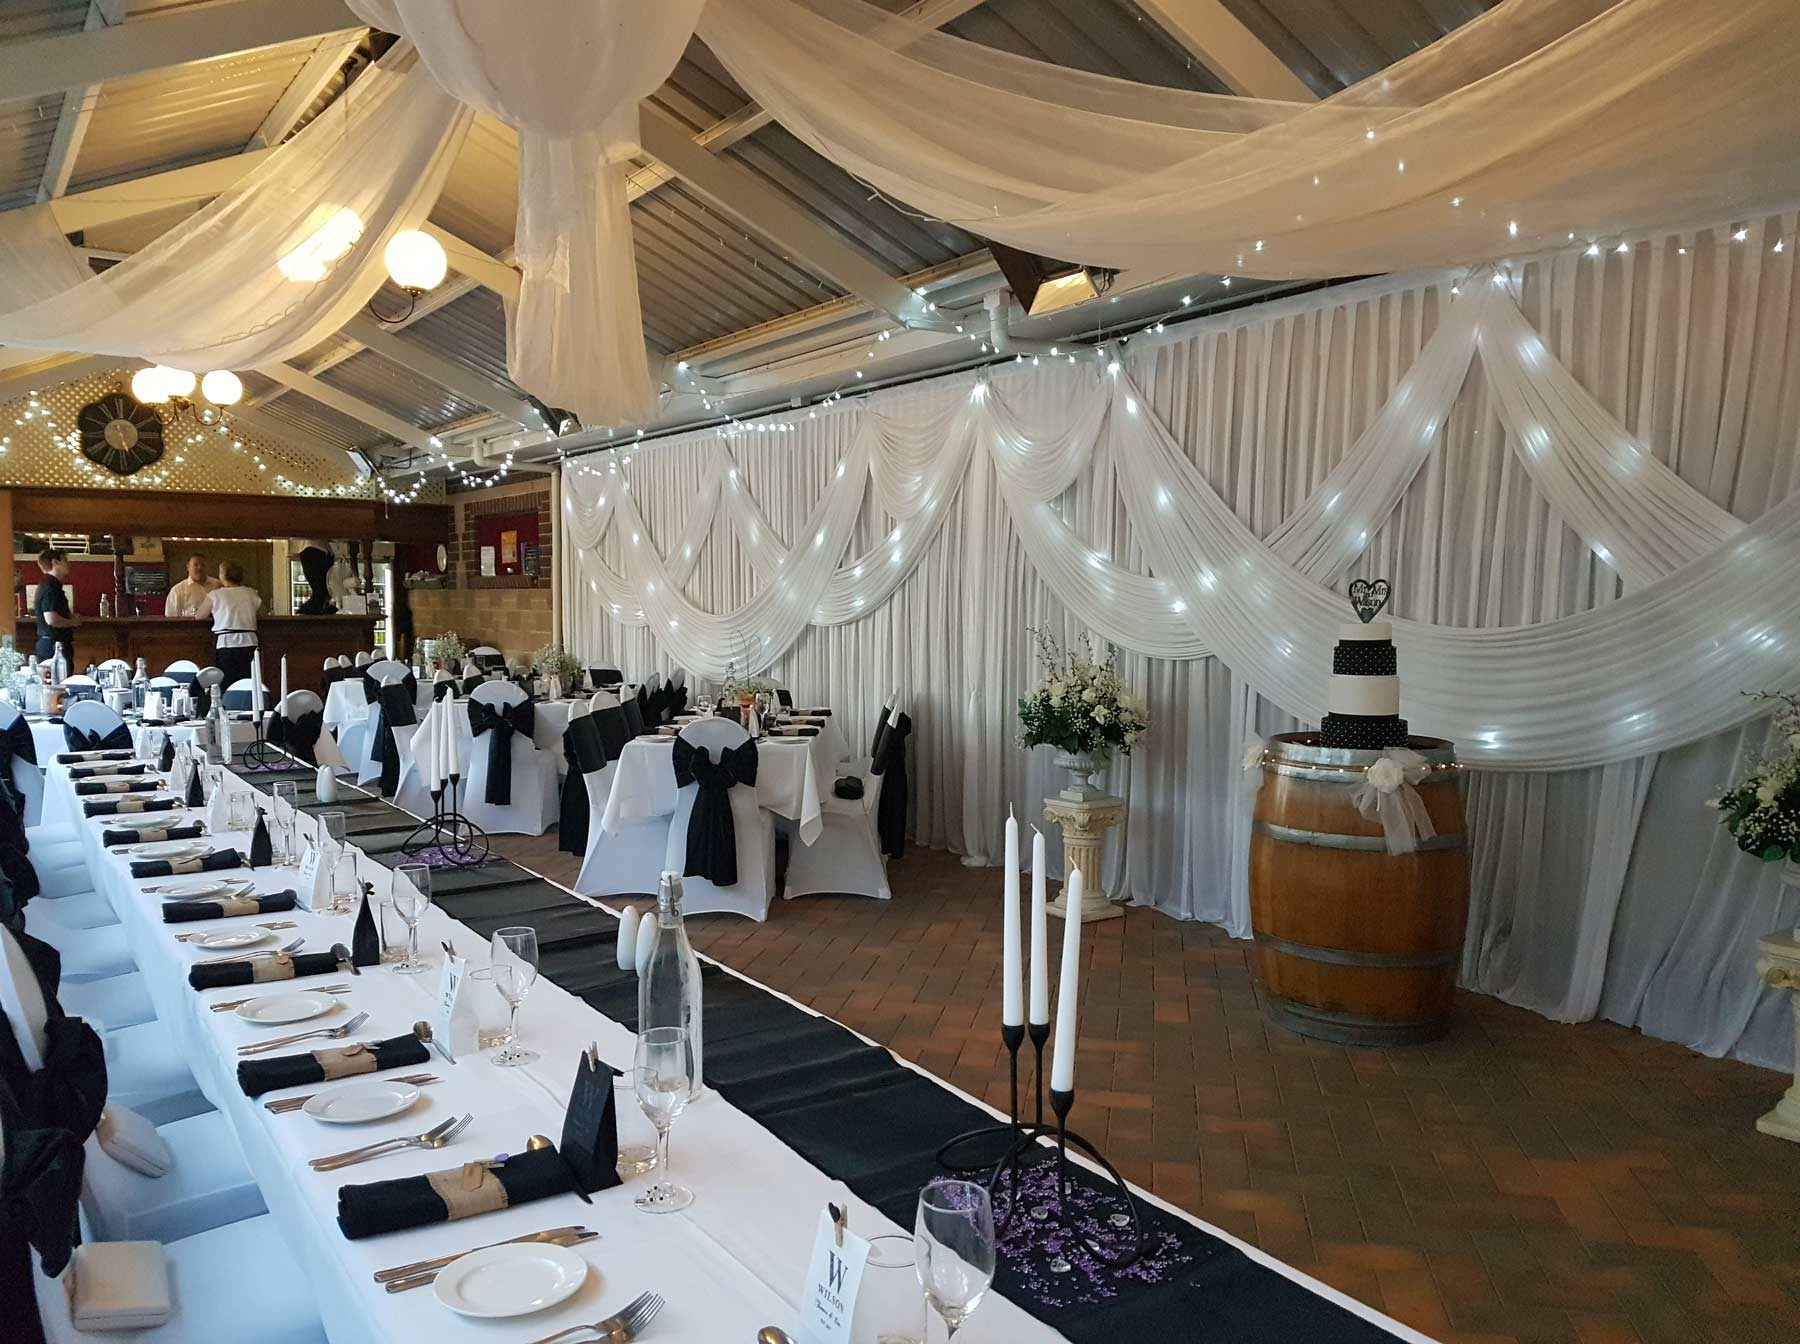 Wedding reception venues adelaide sa south australia - Inside Weddings Venue Weddings Venue Is Ready For Wedding Reception